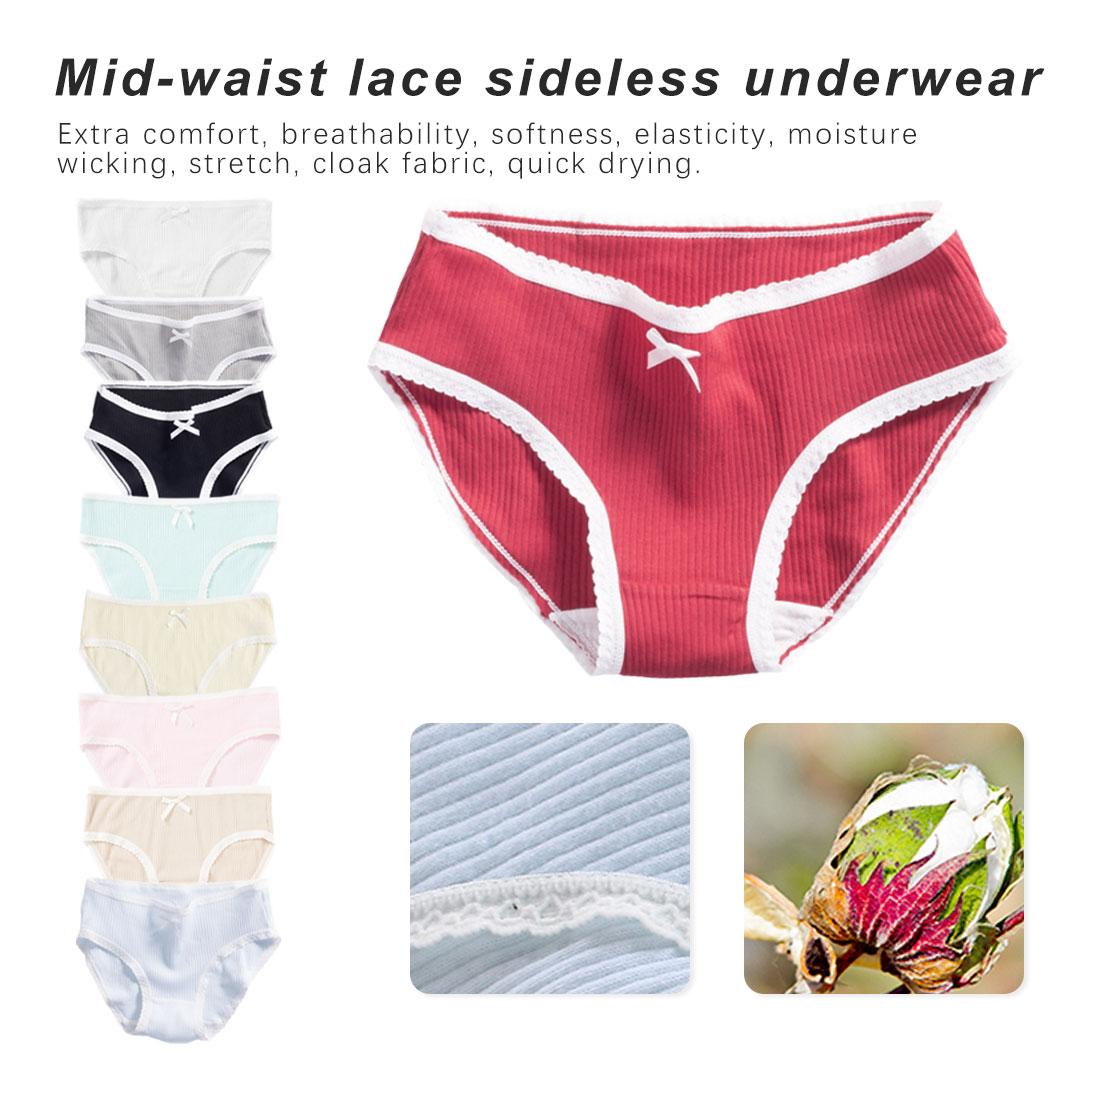 women's panties cotton underwear lace female briefs seam less under pantIes sexy lingerie woman intimate ladies panty